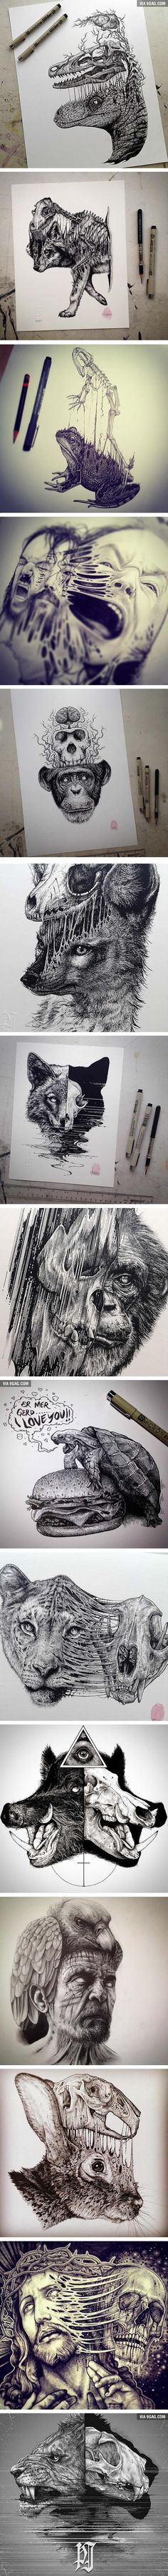 Animals Leave Their Skeletons Behind In These Stunning Dark Drawings (By Paul Jackson)